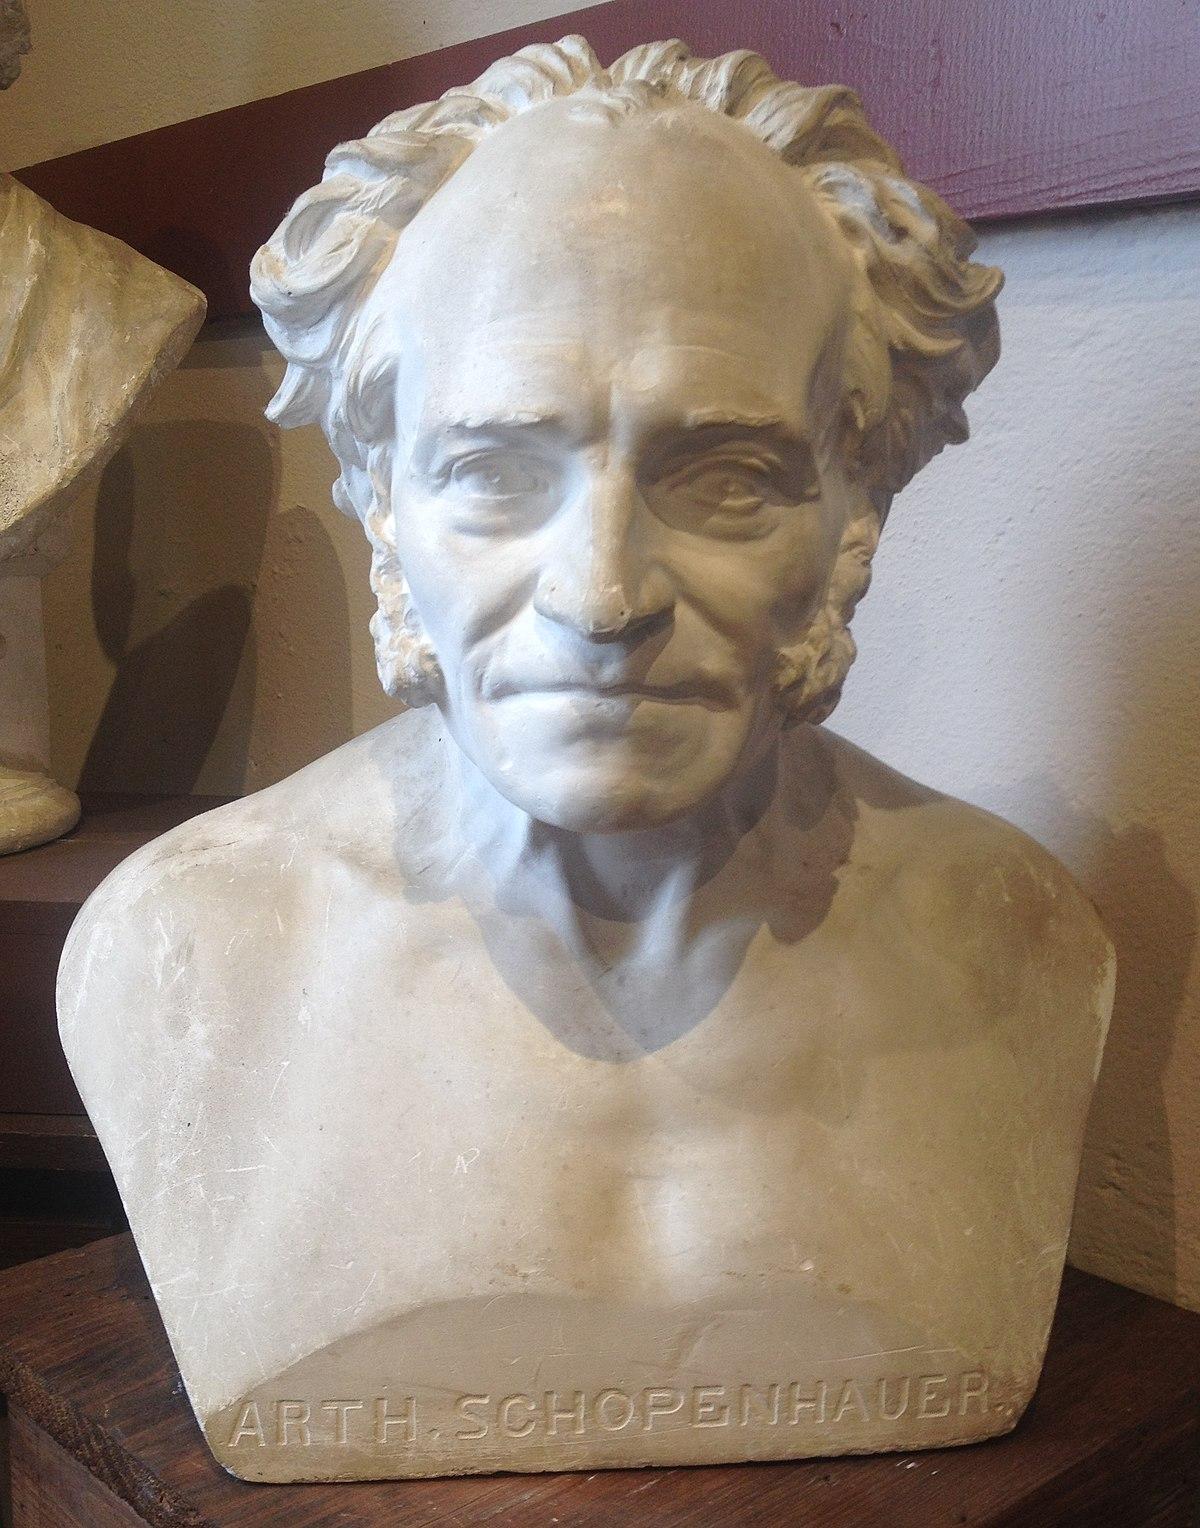 arthur schopenhauer sculpture wikipedia